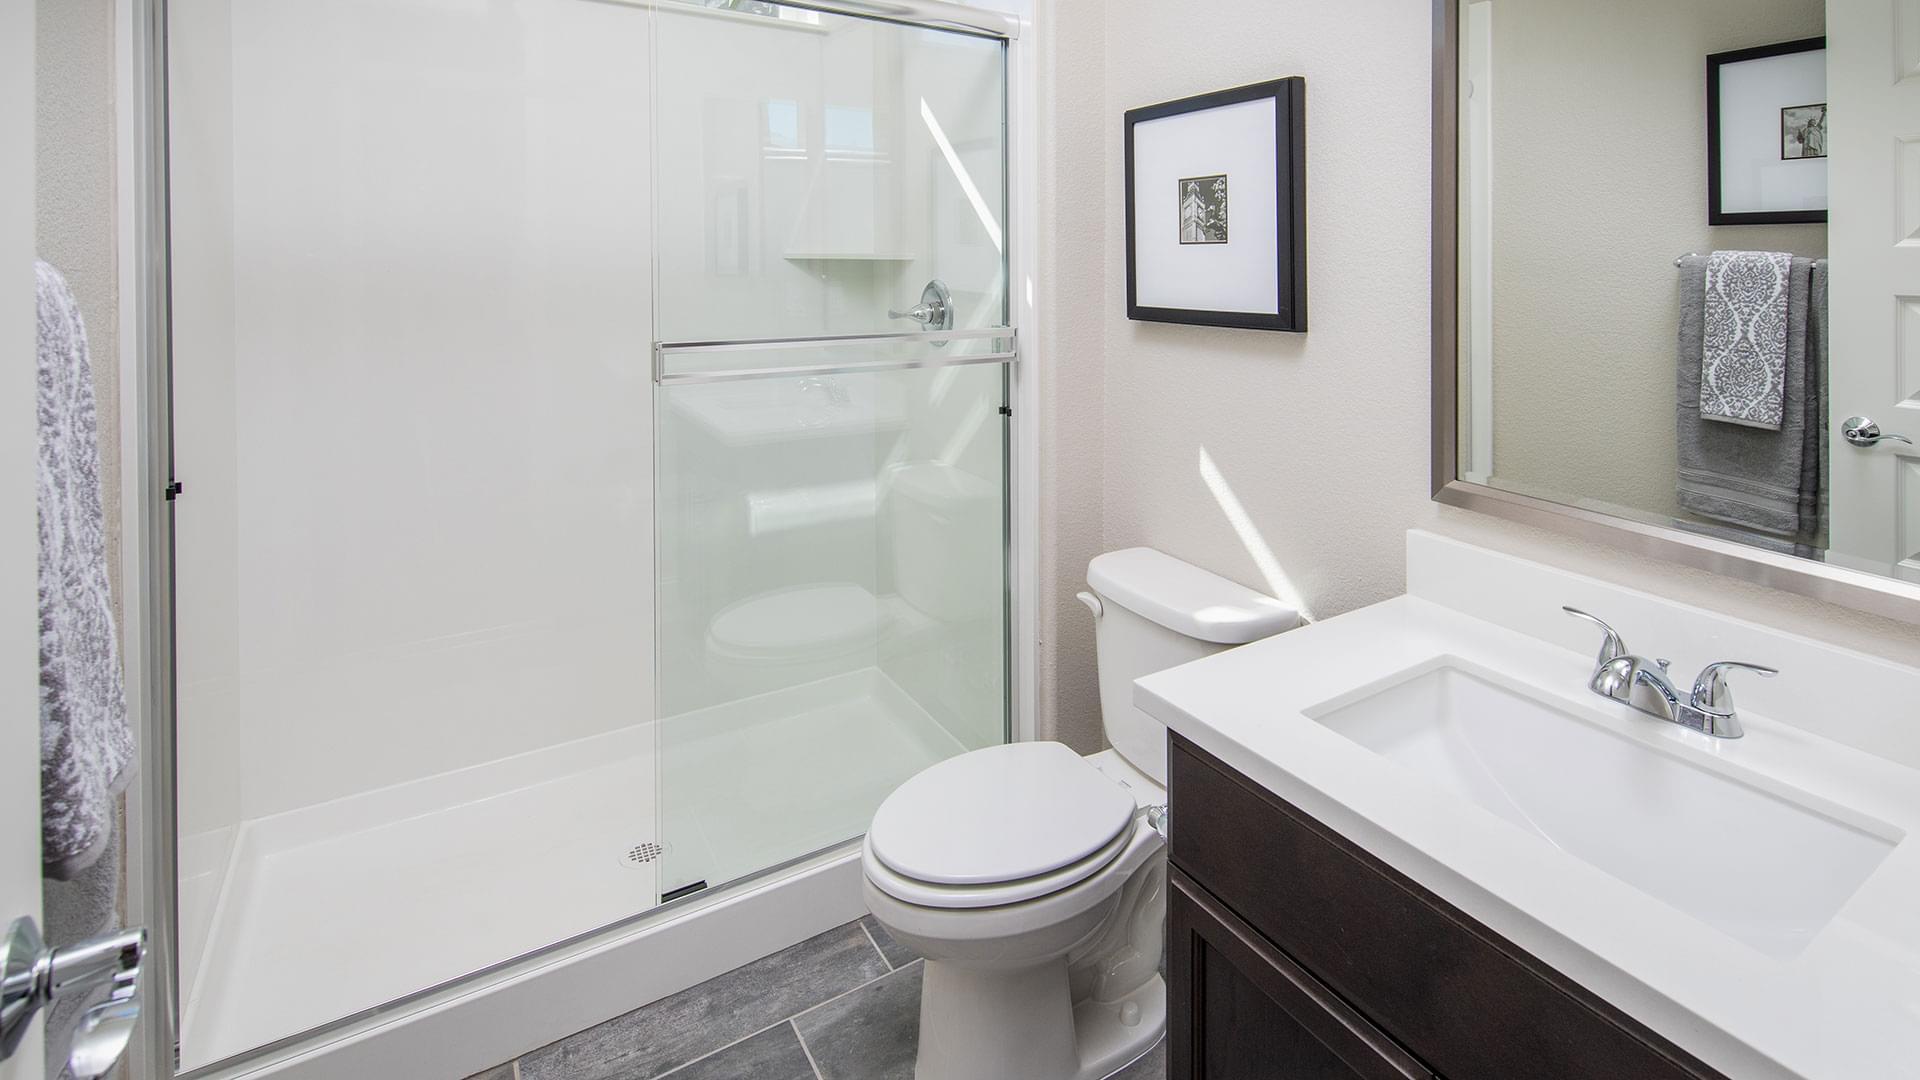 Residence 3 Bathroom